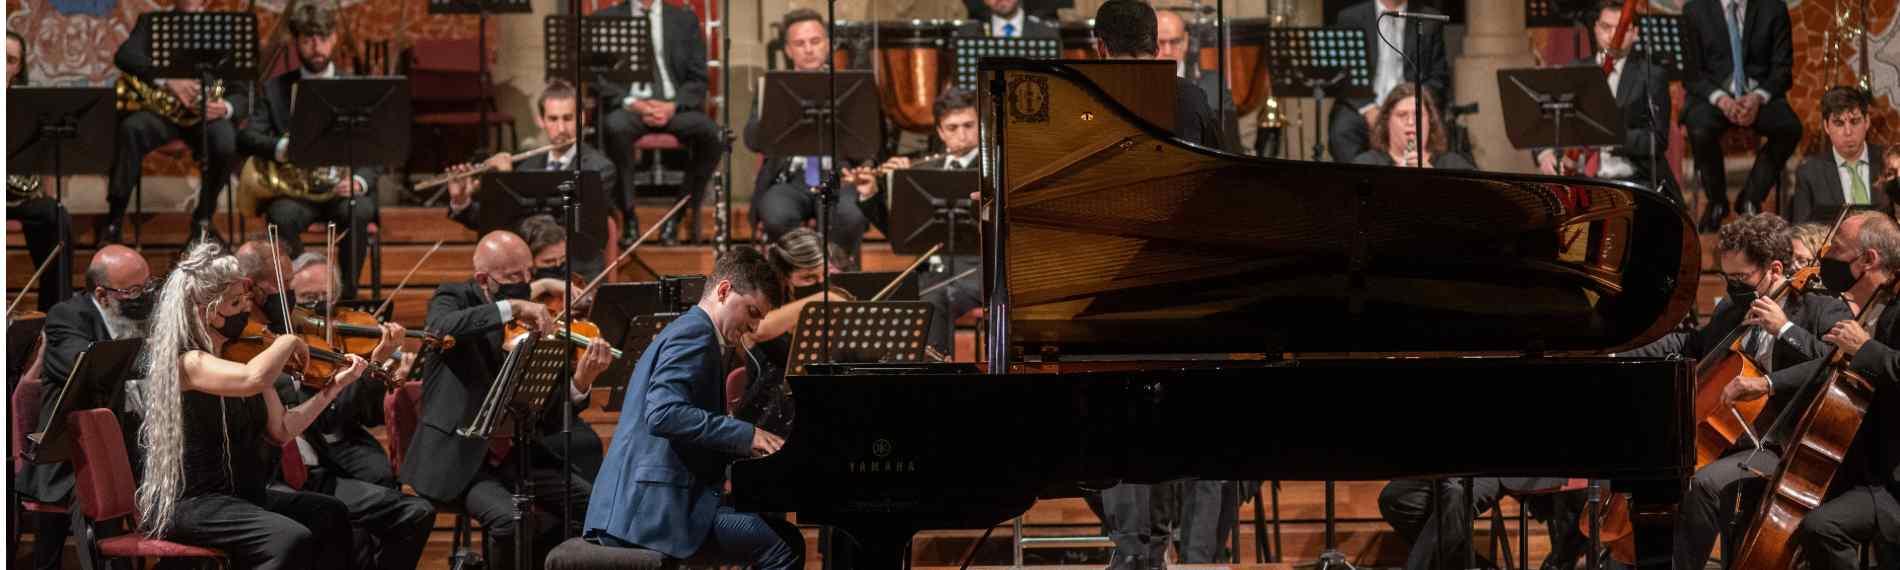 Concurso Internacional de música Maria Canals